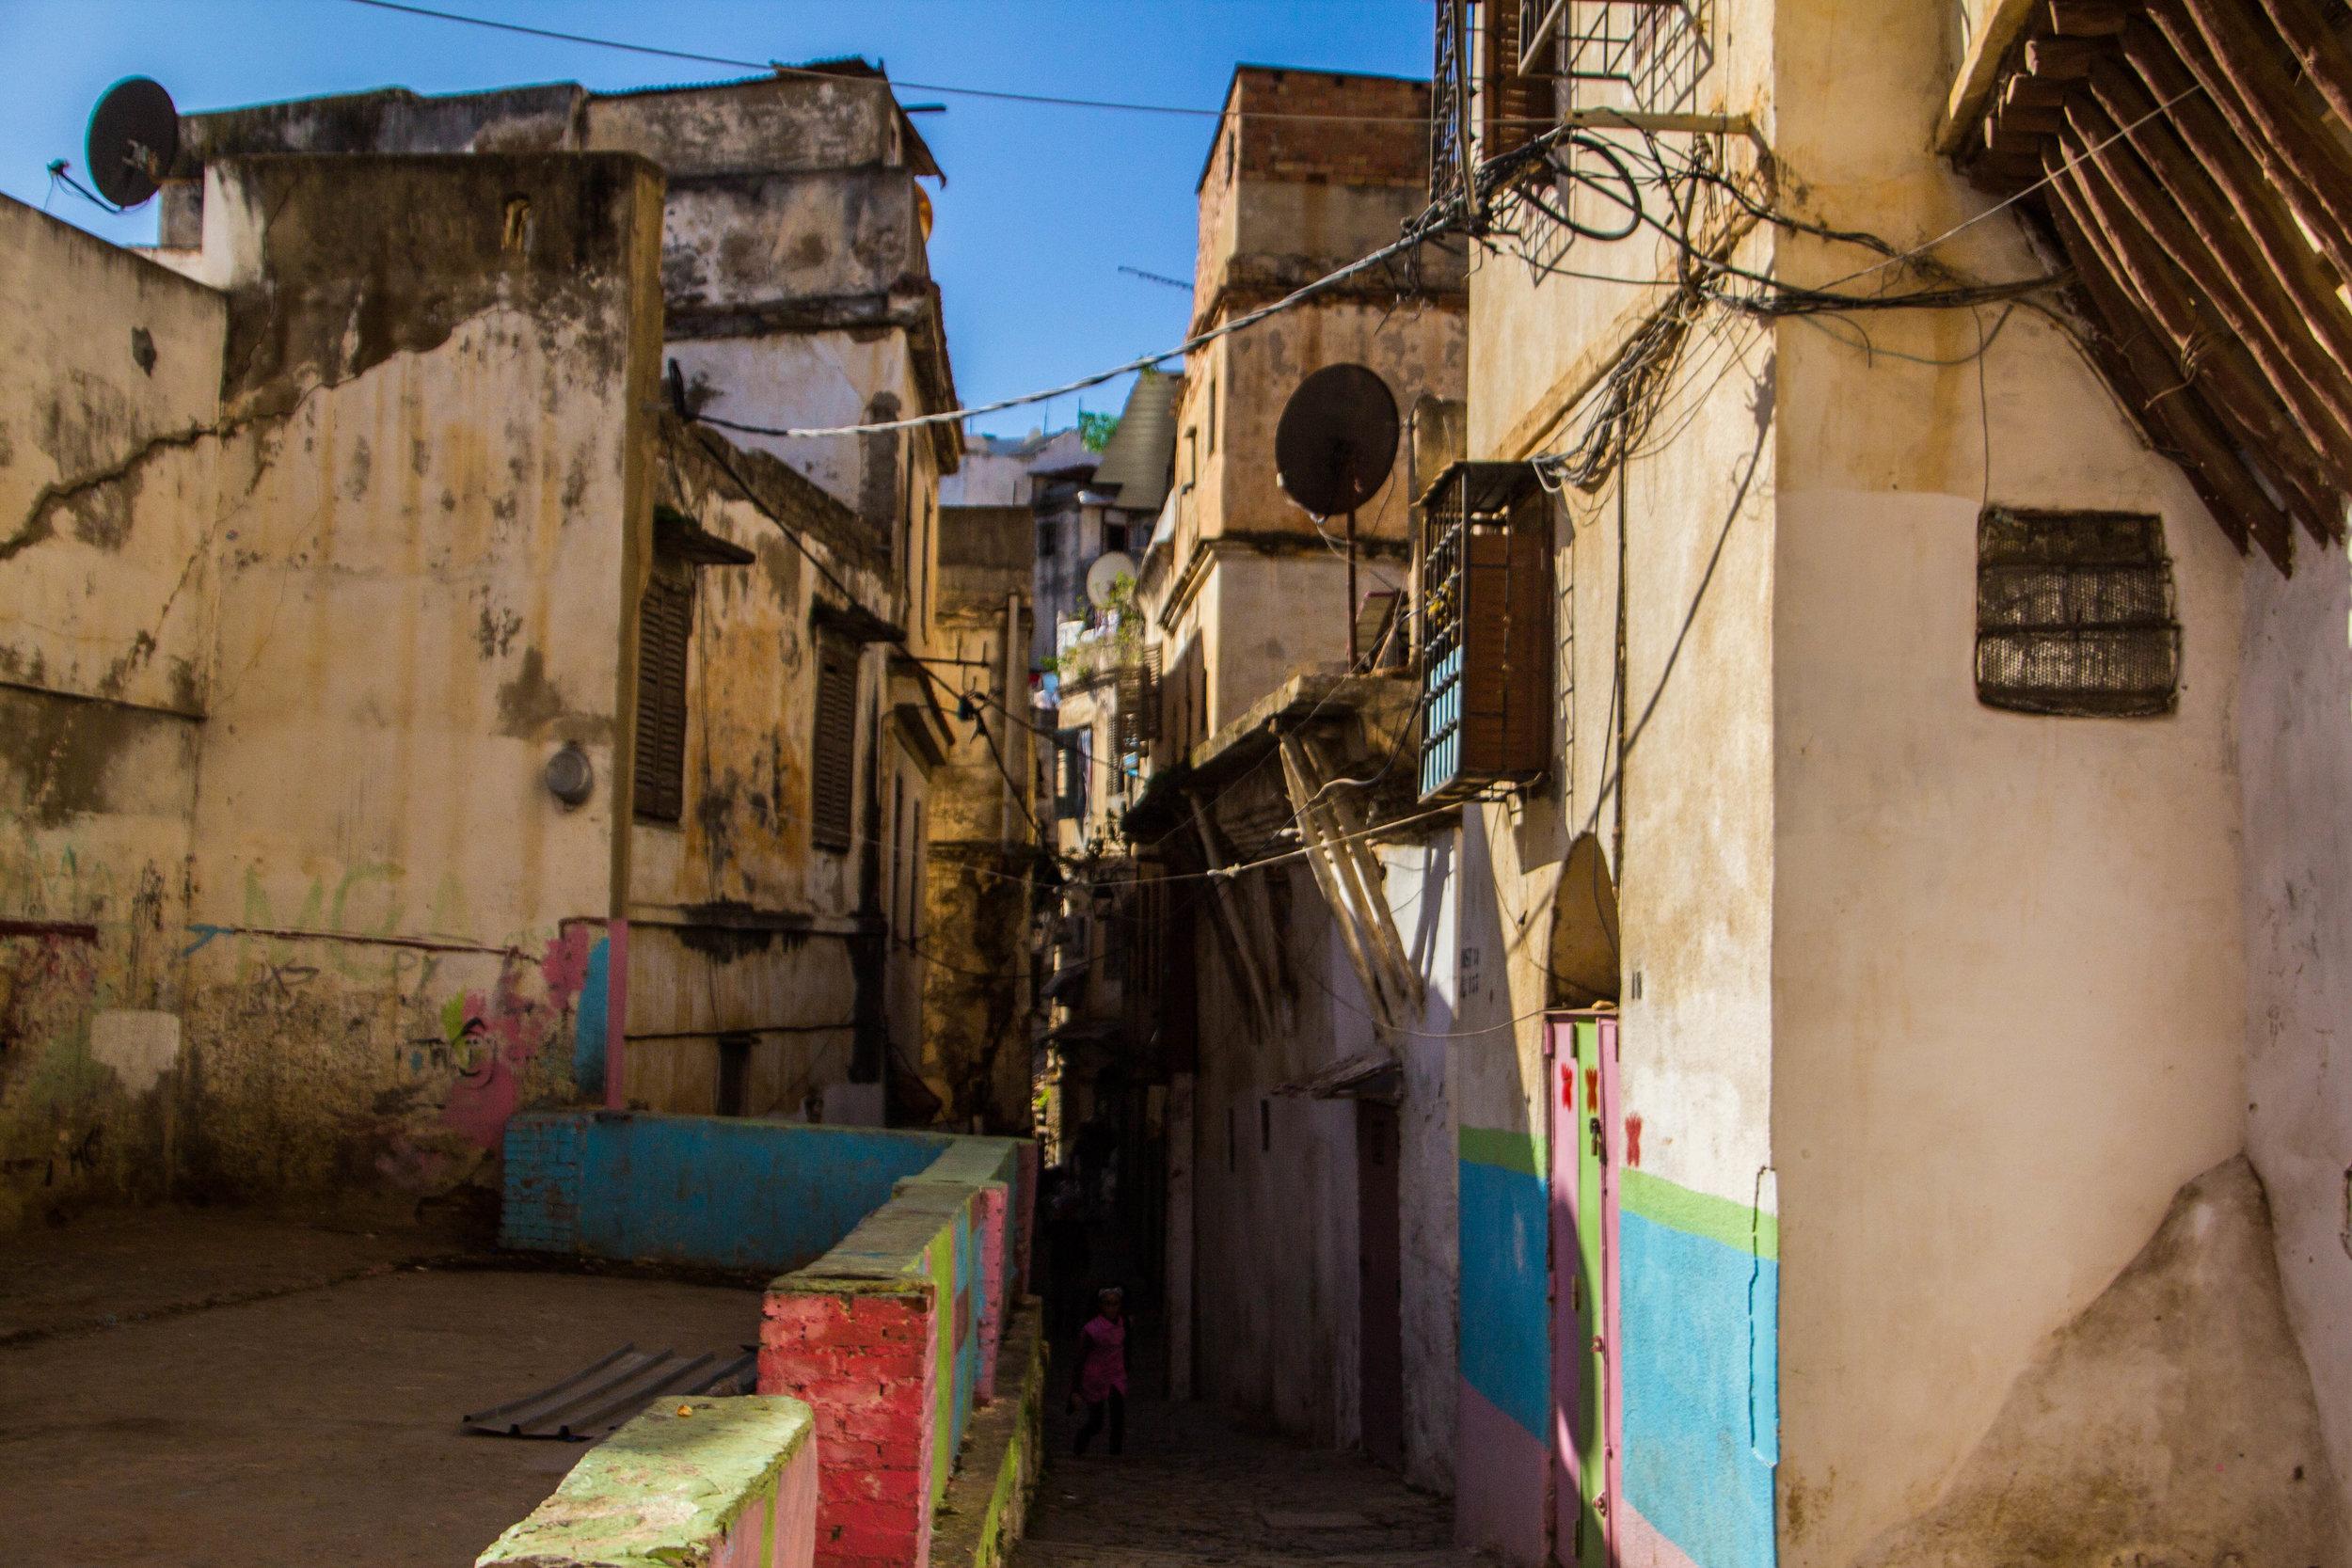 casbah-photography-algiers-algeria-alger-24.jpg